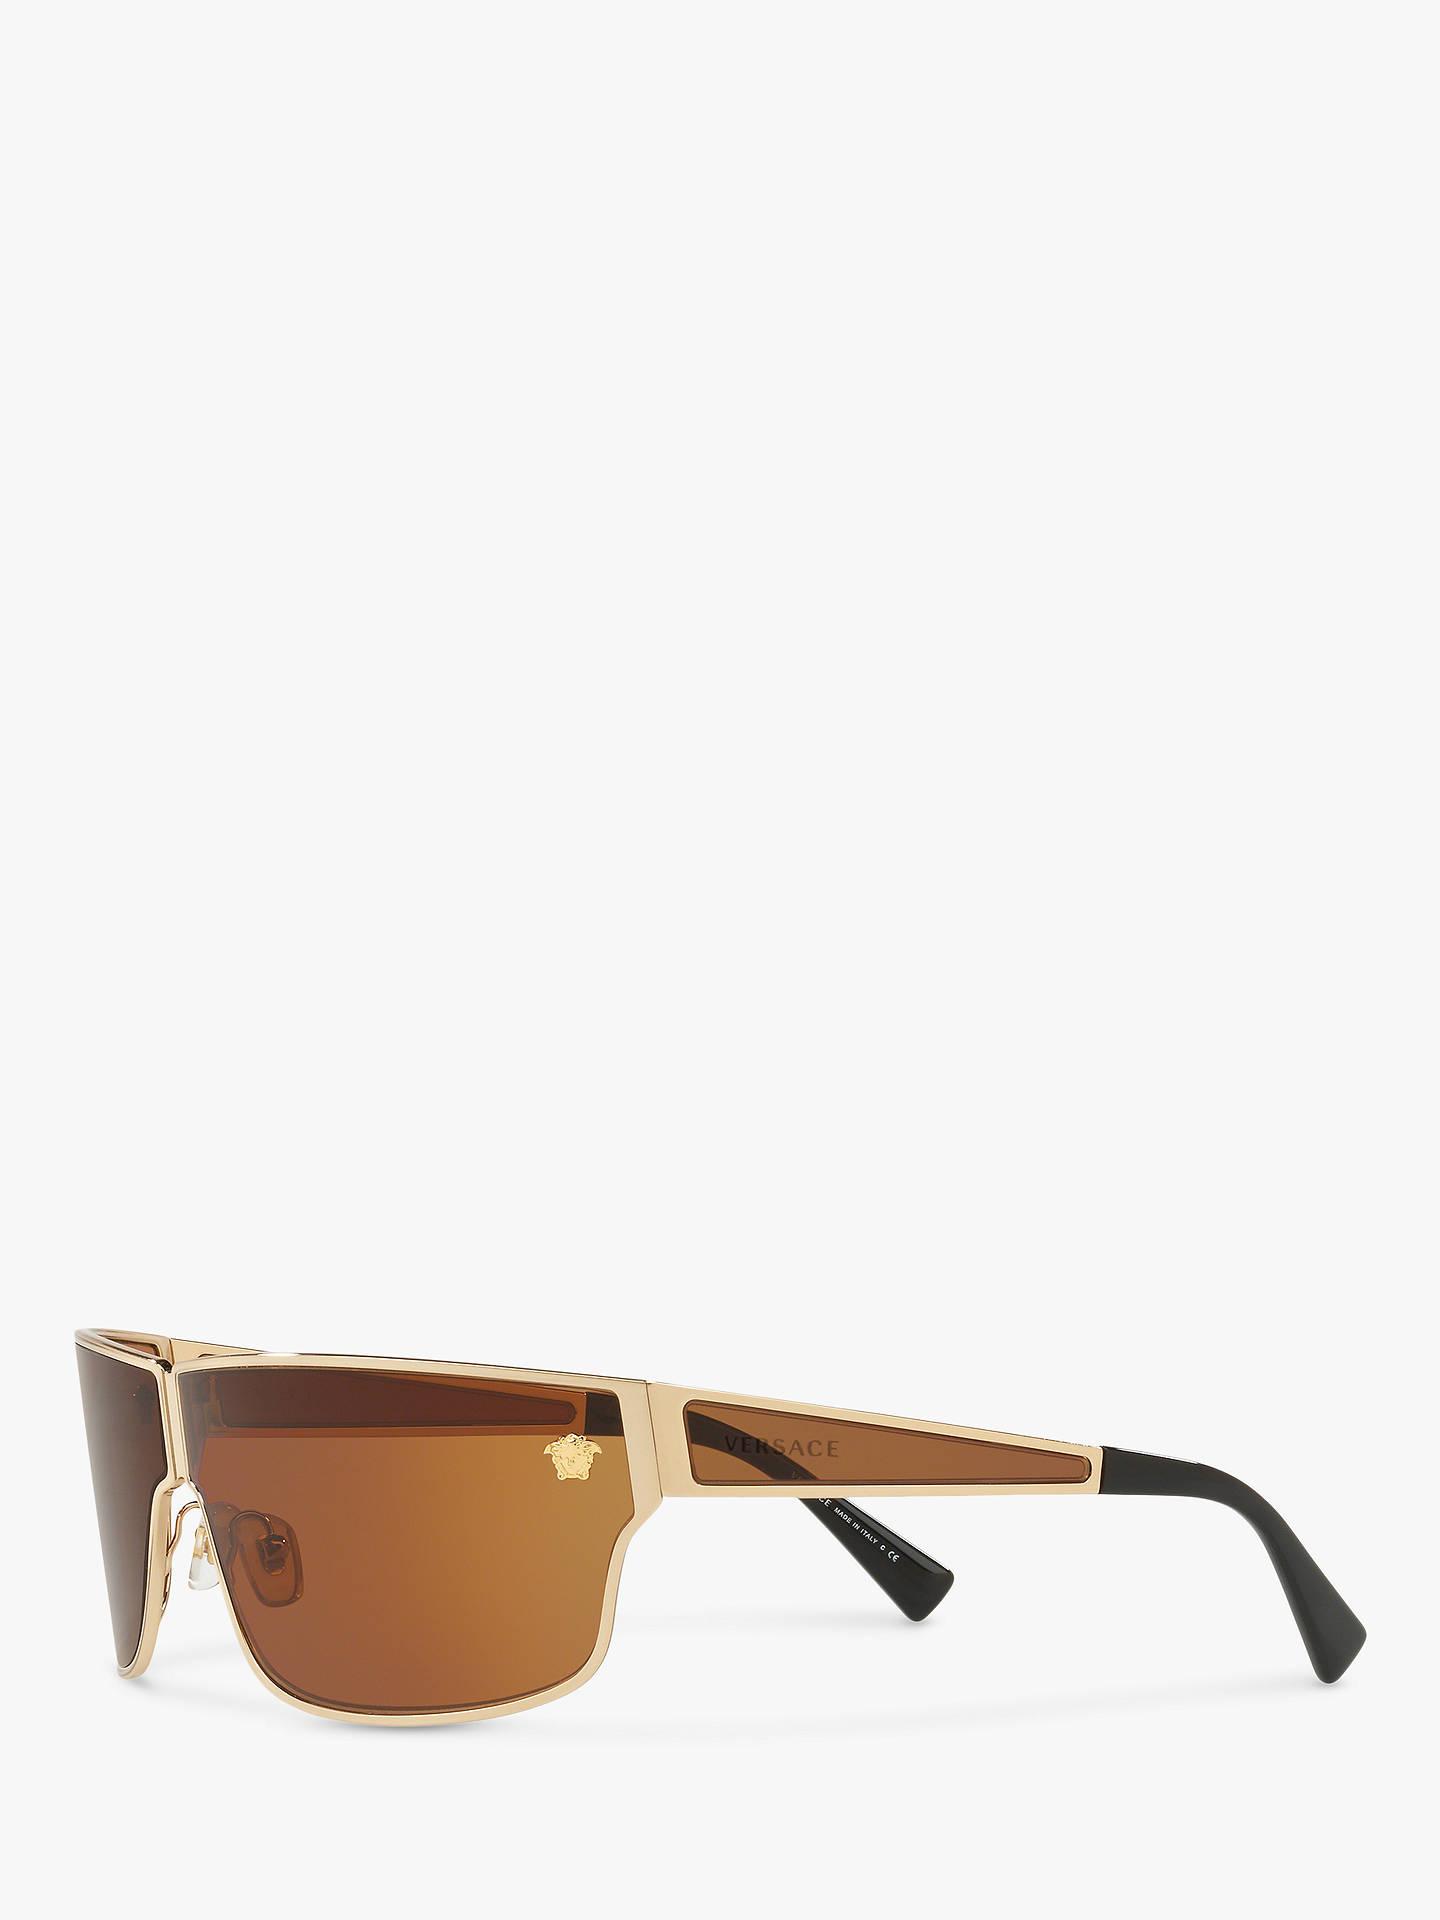 Versace Ve2206 Men S Rectangular Sunglasses Gold Brown